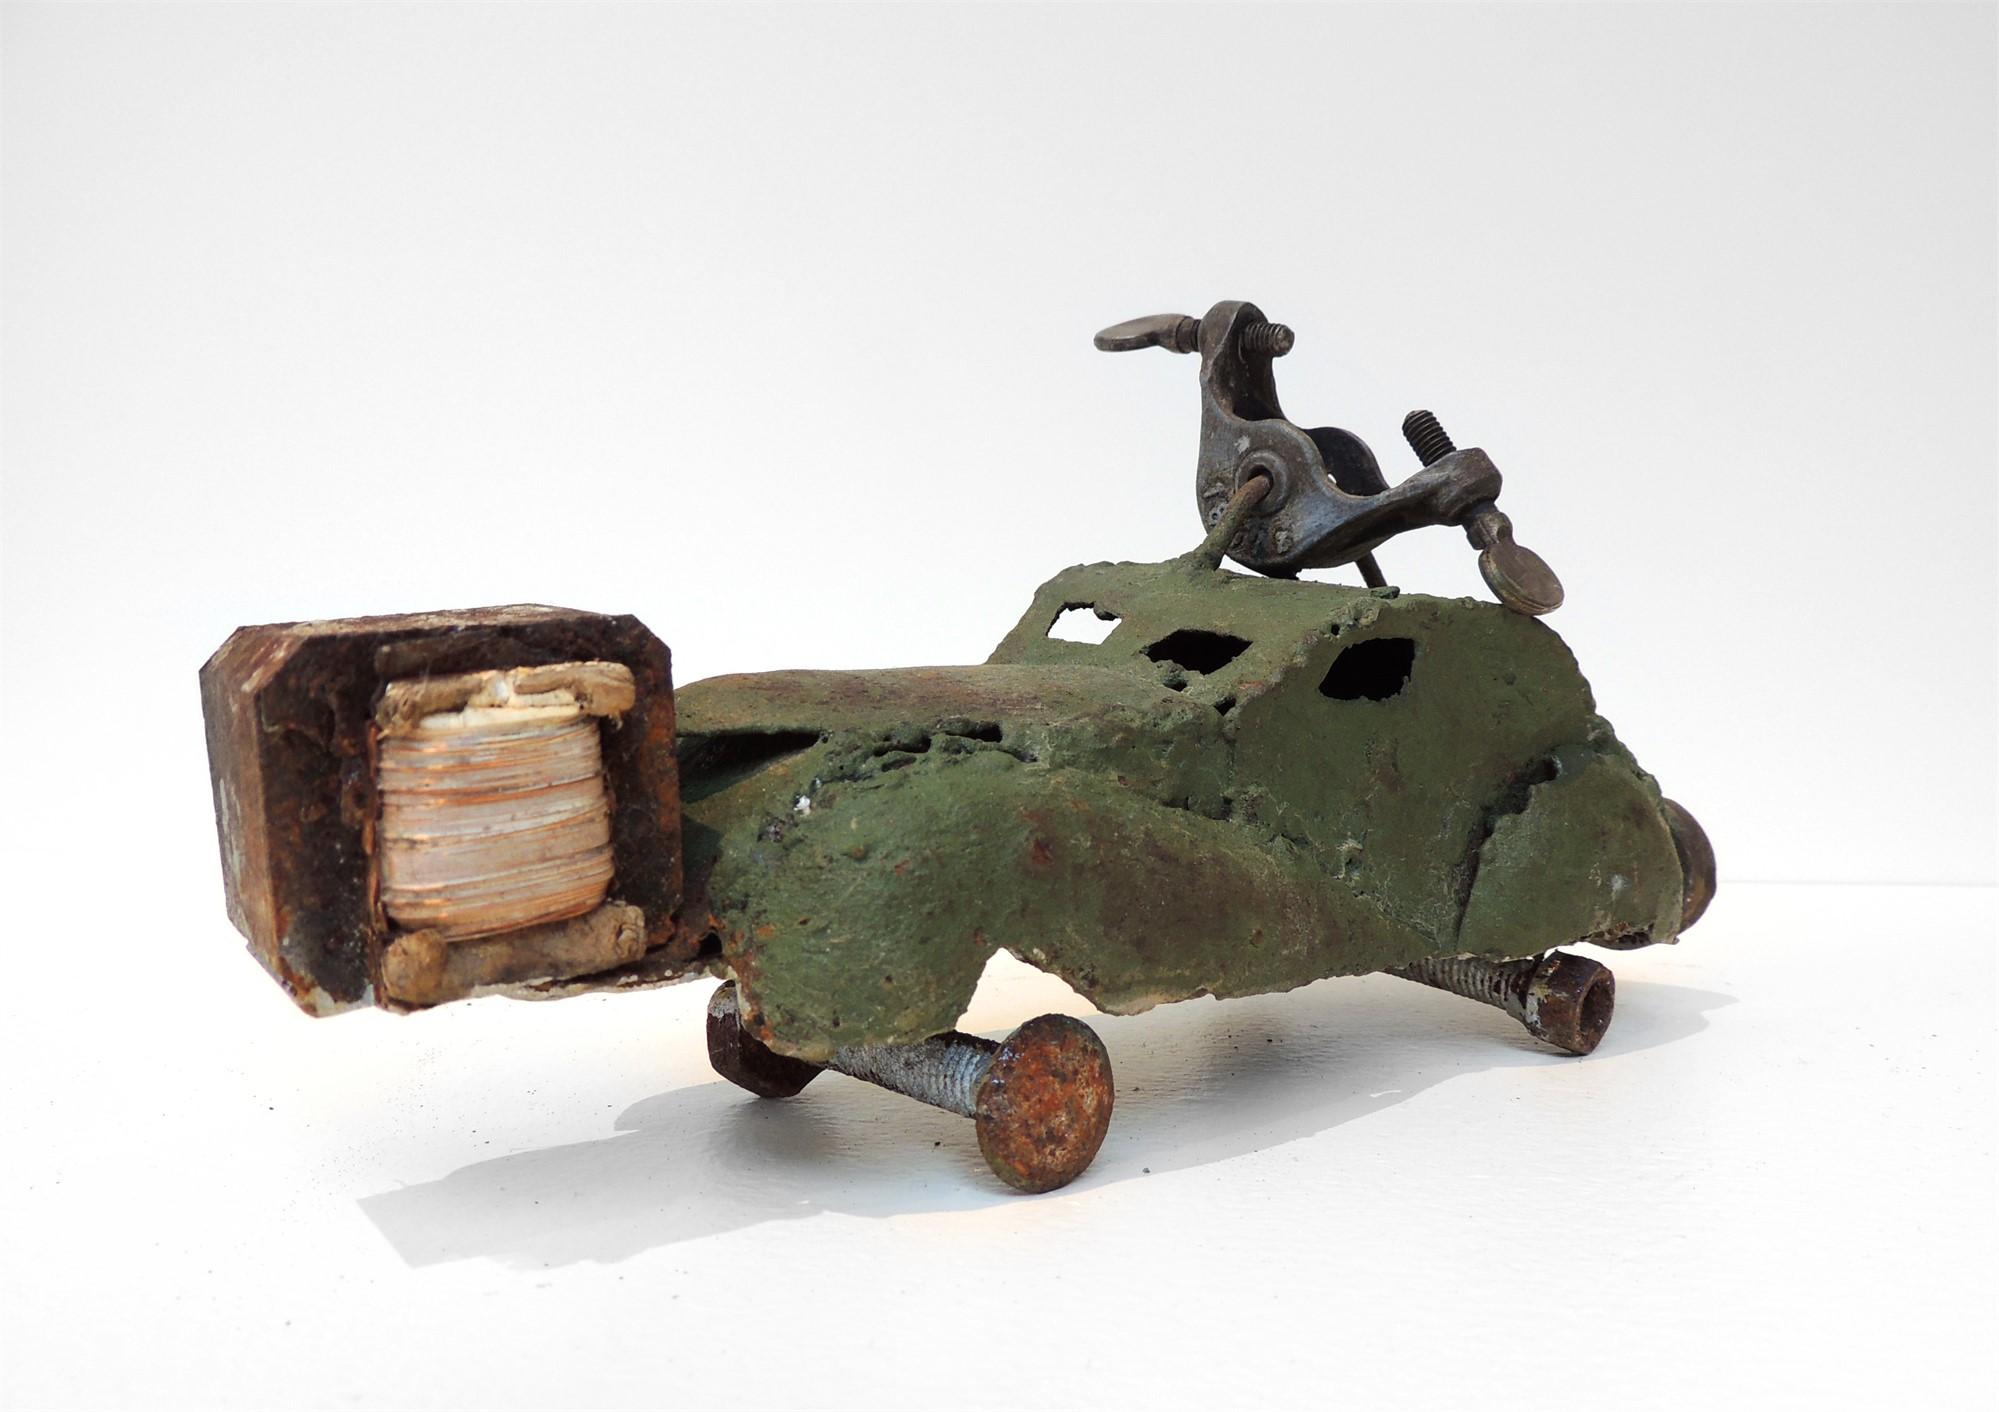 Nichos Series 10: Carro by Wilay Mendez